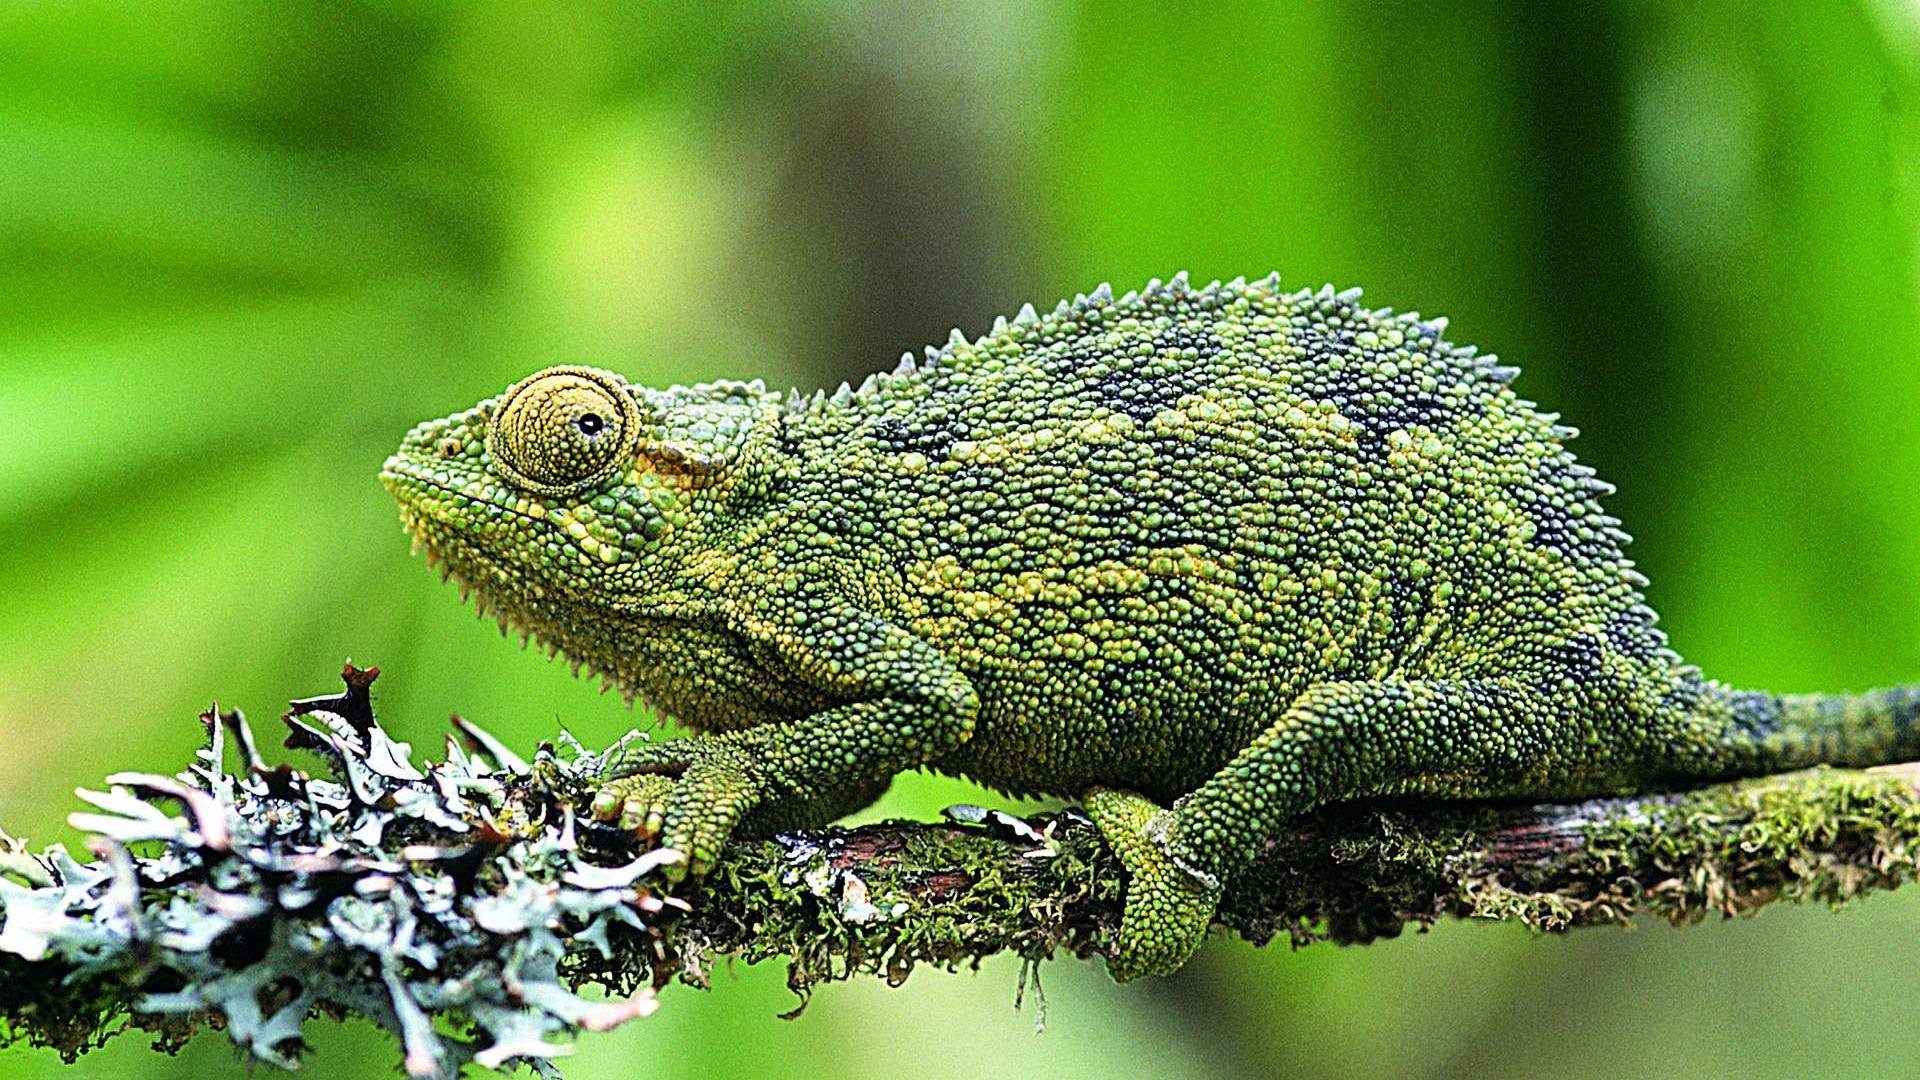 HD lizard wallpaper albums 6 1920x1080 Wallpaper Download HD